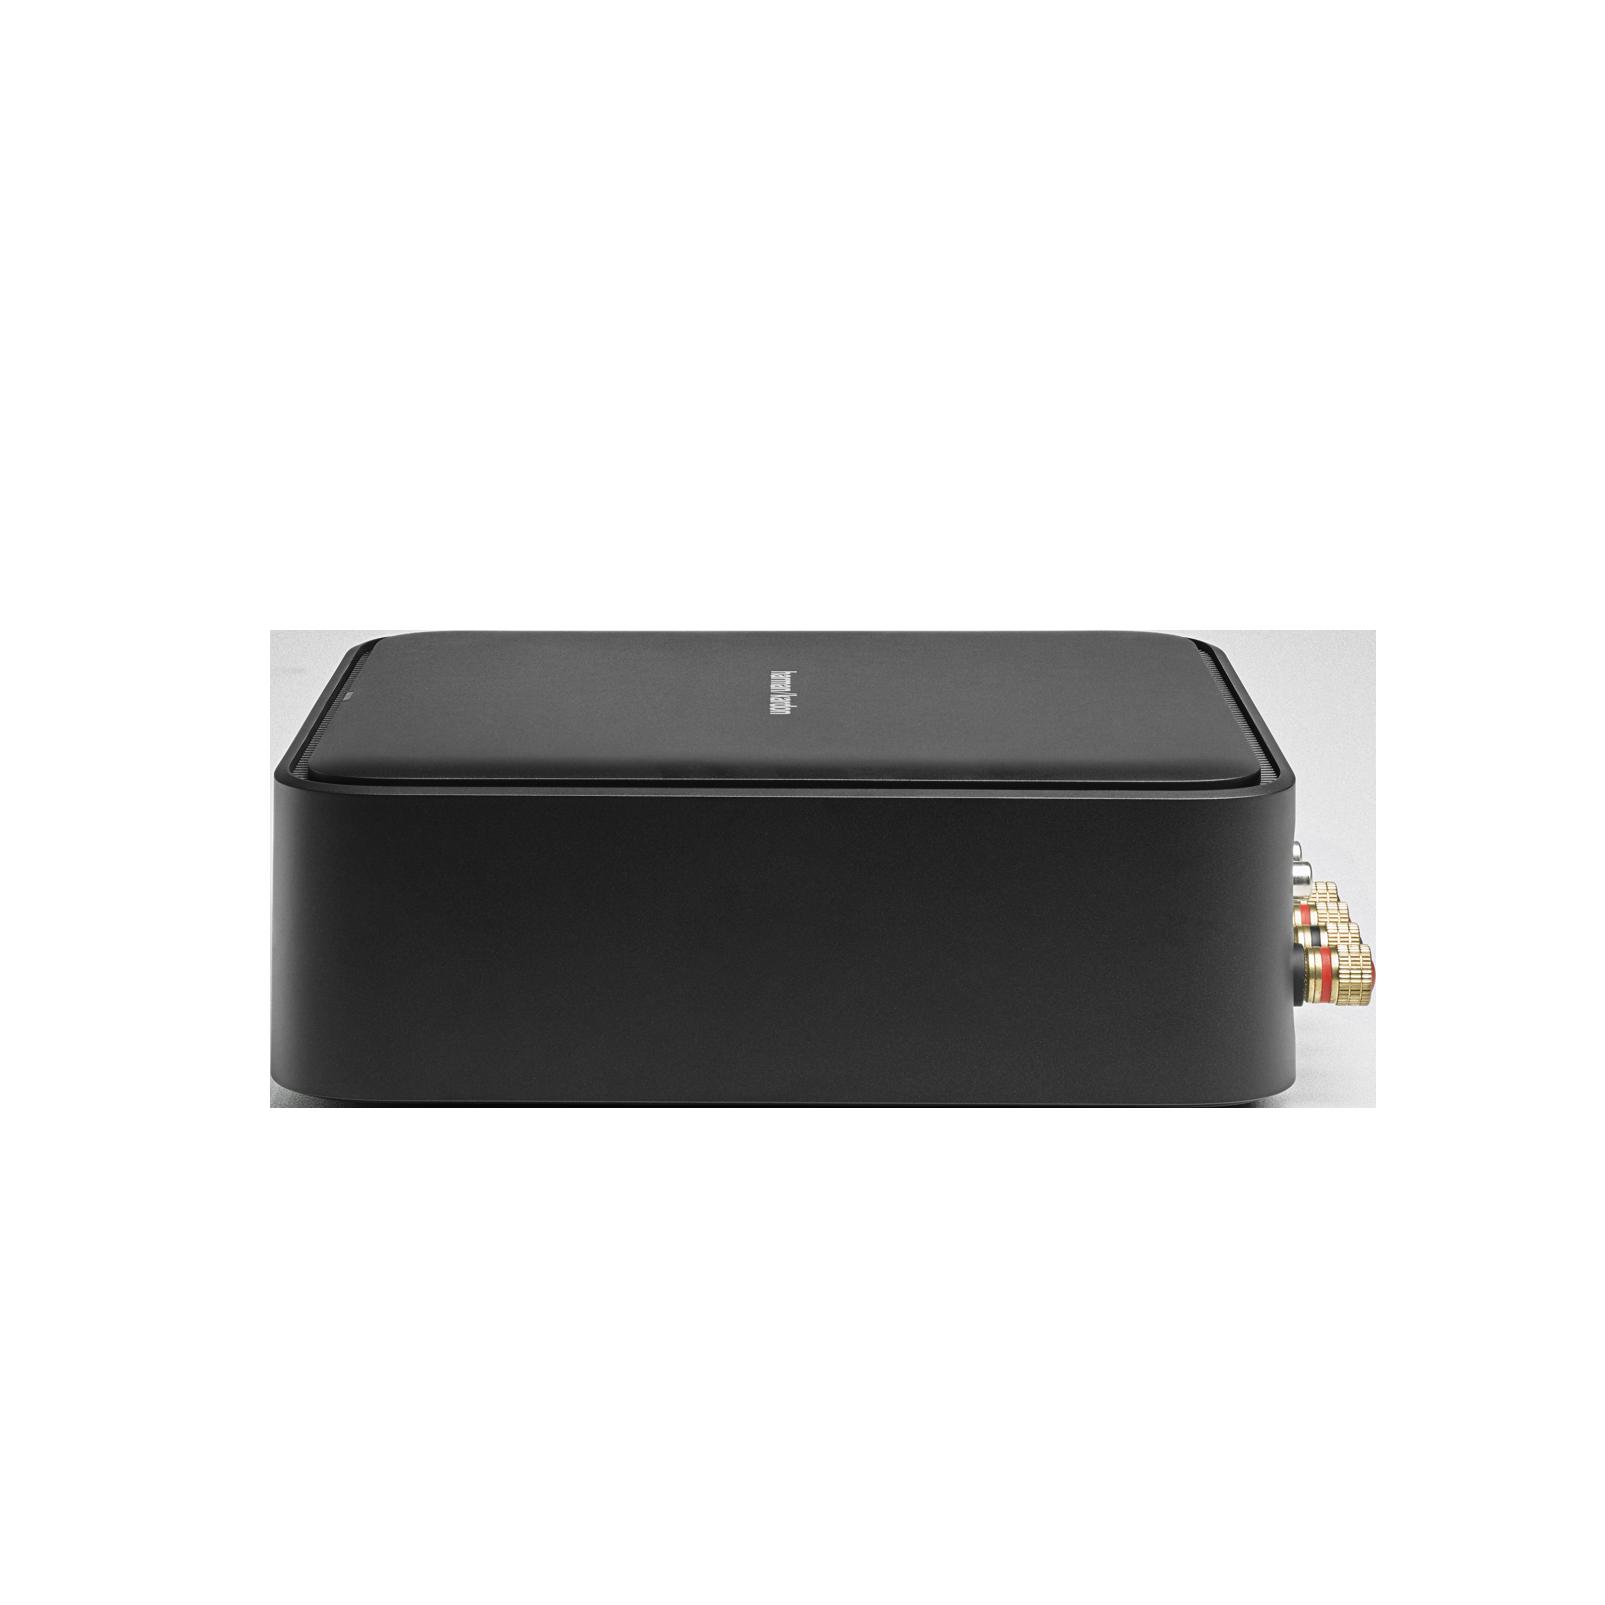 Harman Kardon Citation Amp - Black - High-power, wireless streaming stereo amplifier - Detailshot 1